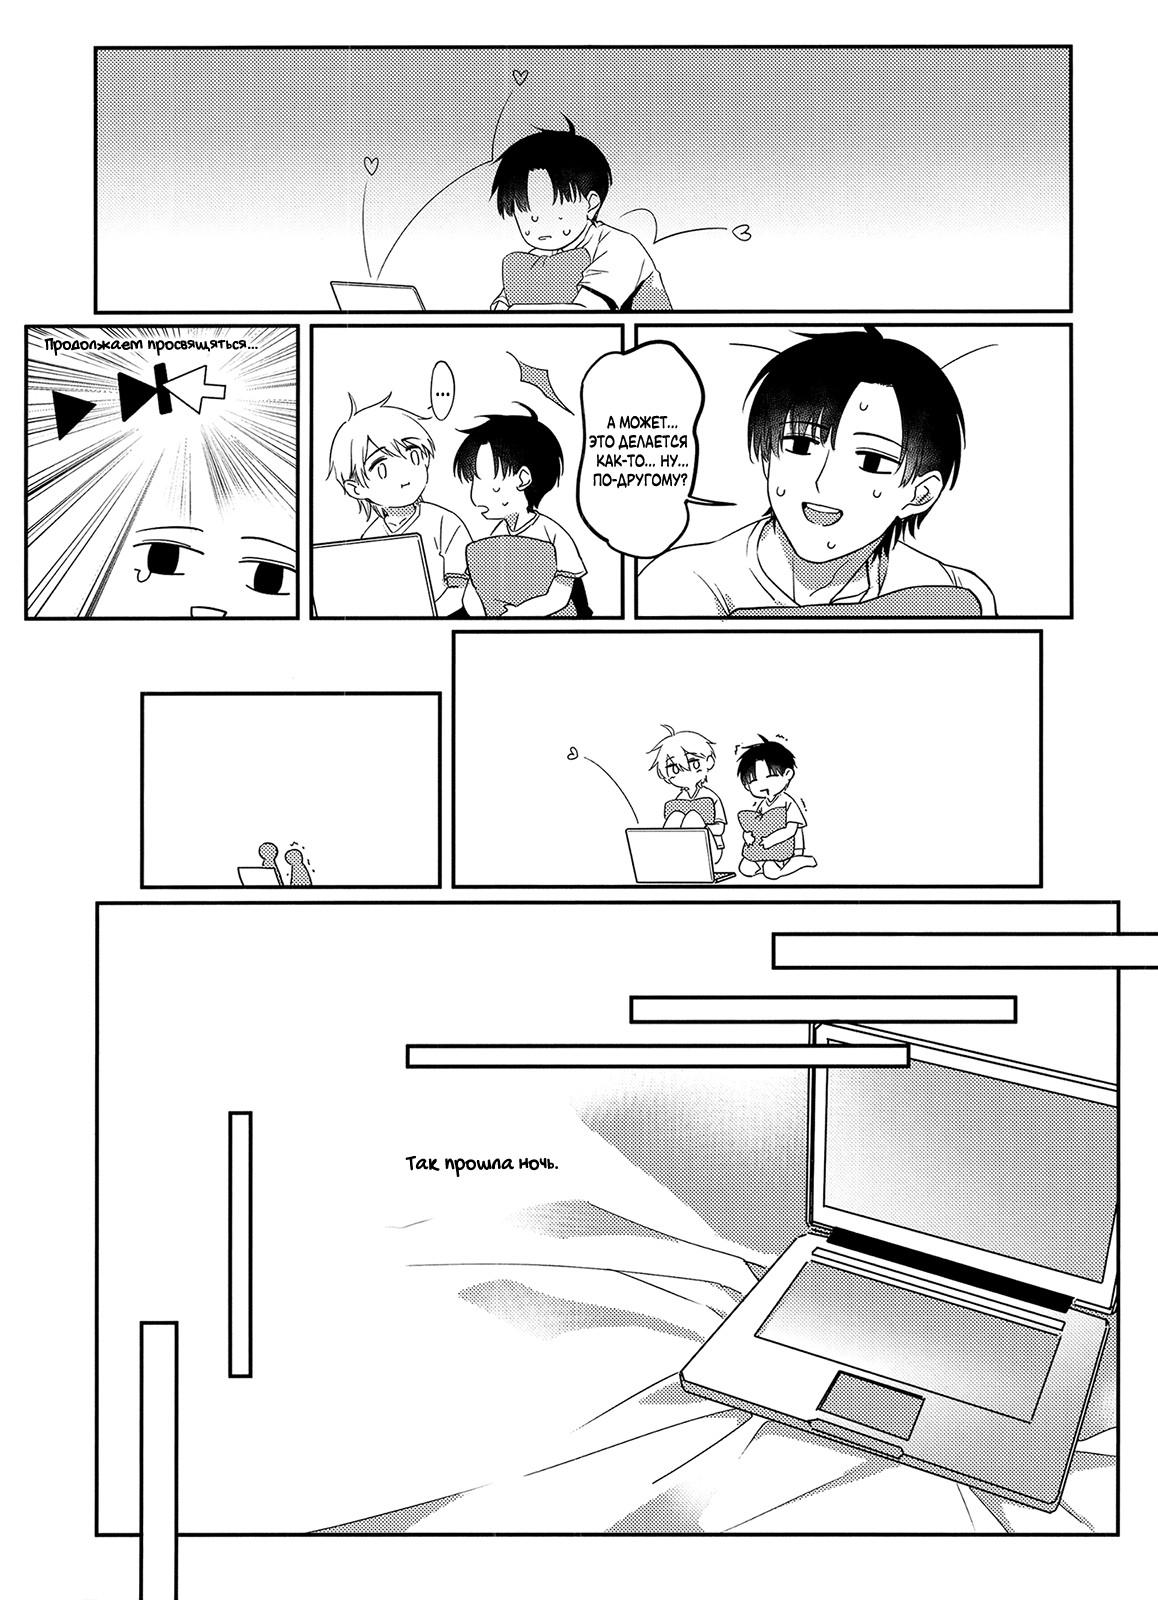 https://r2.ninemanga.com/comics/pic4/15/37839/1338050/155738153499.jpg Page 16